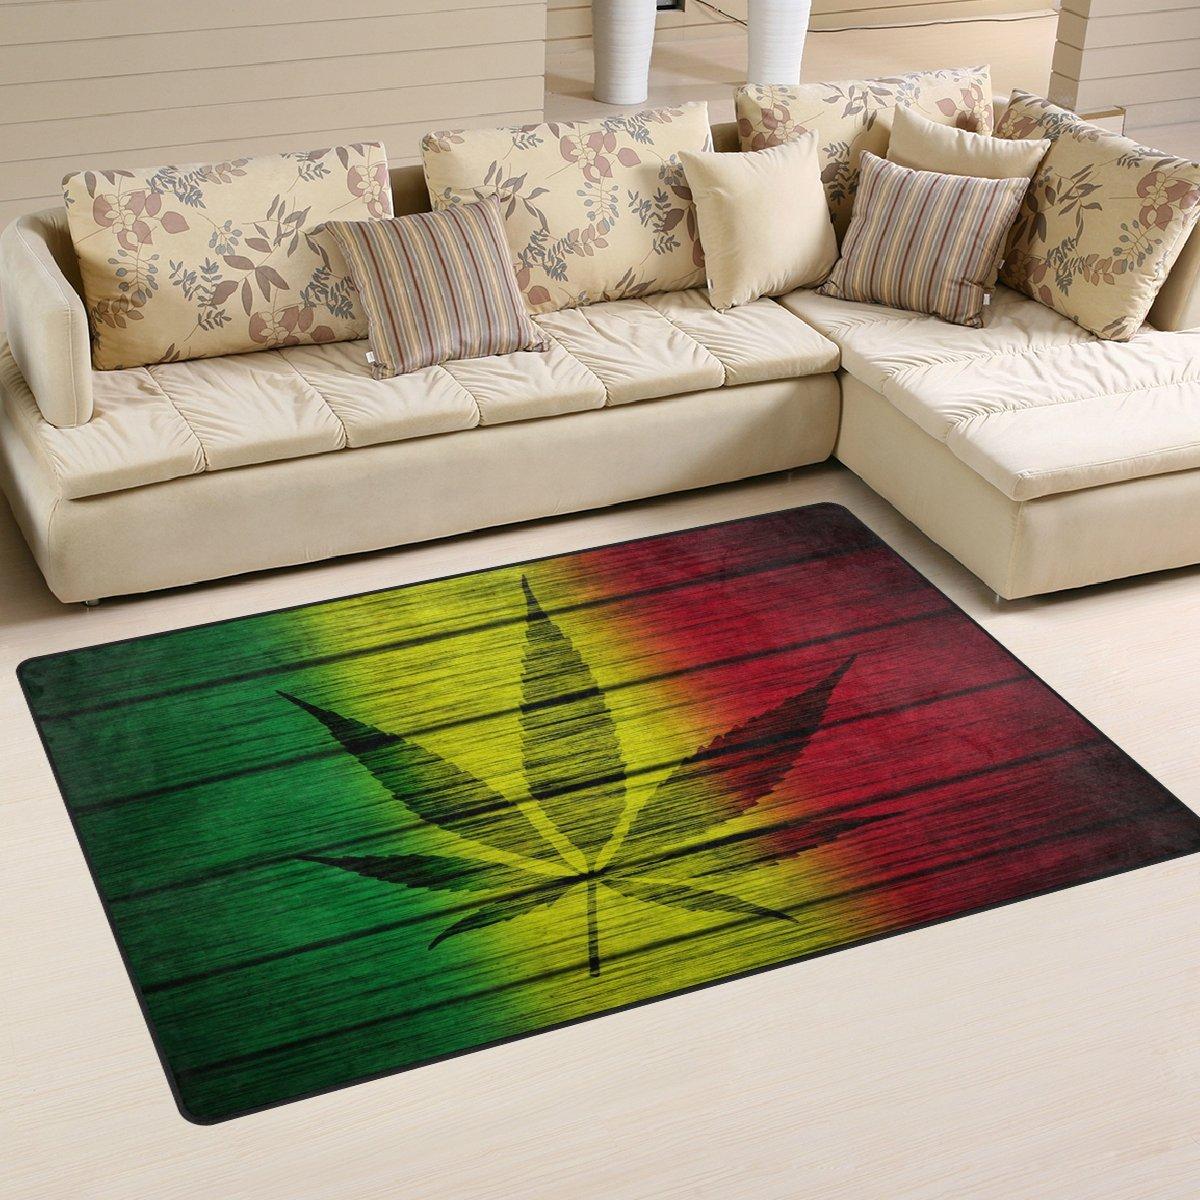 WOZO Wood Flag Marijuana Leaf Area Rug Rugs Non-Slip Floor Mat Doormats Living Room Bedroom 31 x 20 inches g2489548p146c161s240